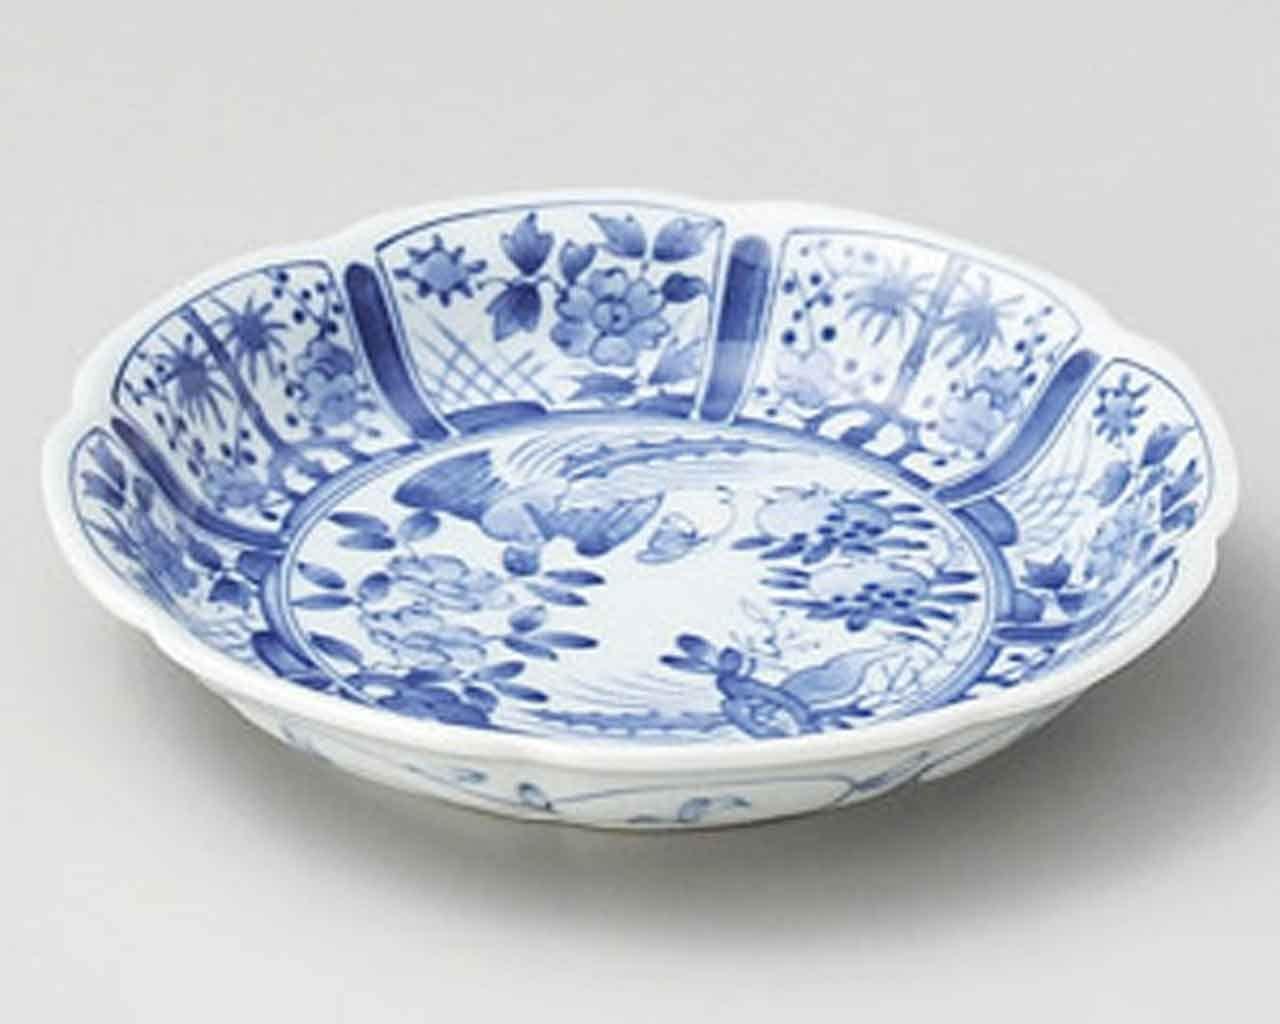 Yukiwa Kacho 5.3inch Set of 5 Small Plates White porcelain Made in Japan